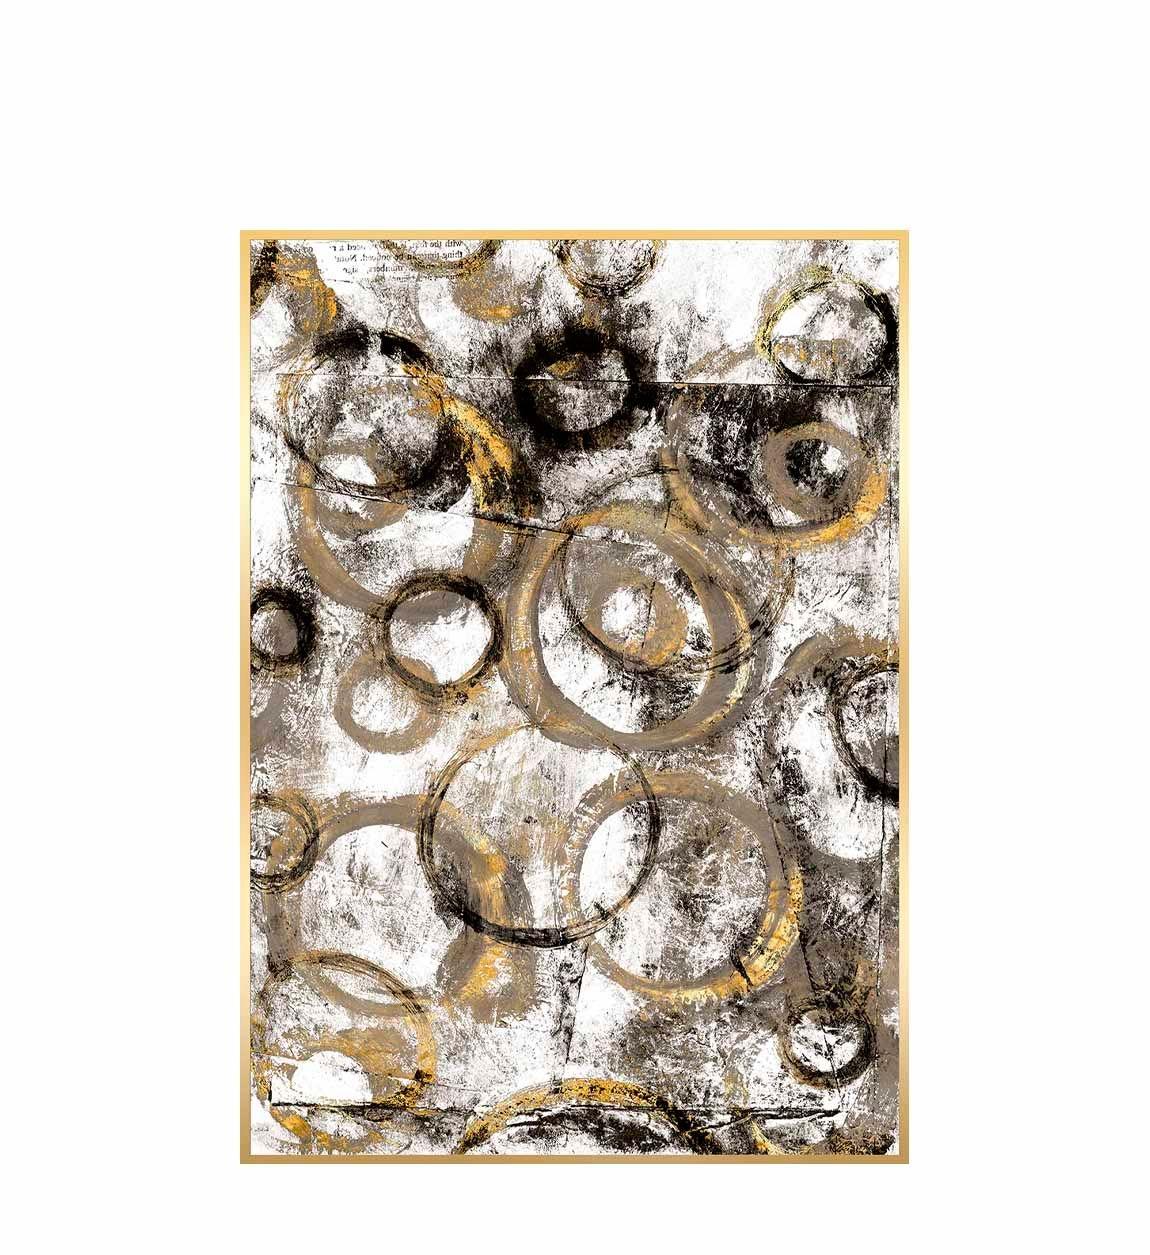 Tablou Canvas Creta Golden Circles, 60 x 90 cm imagine